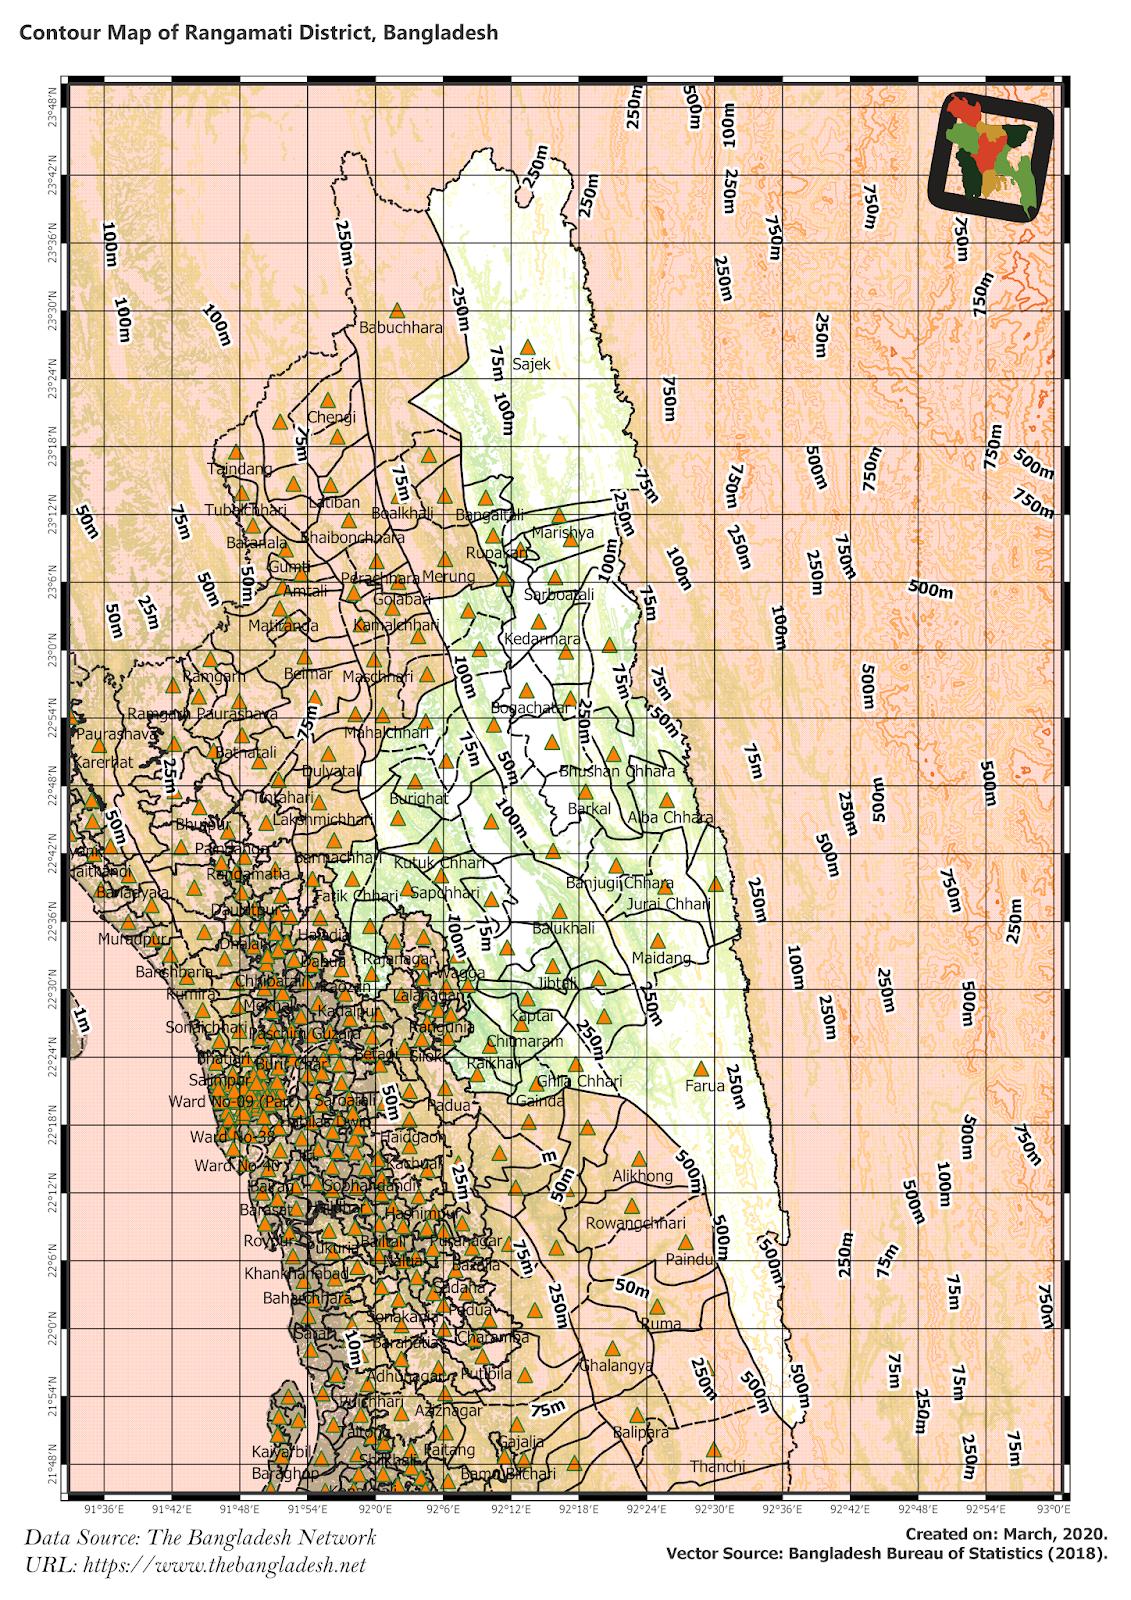 Elevation Map of Rangamati District of Bangladesh